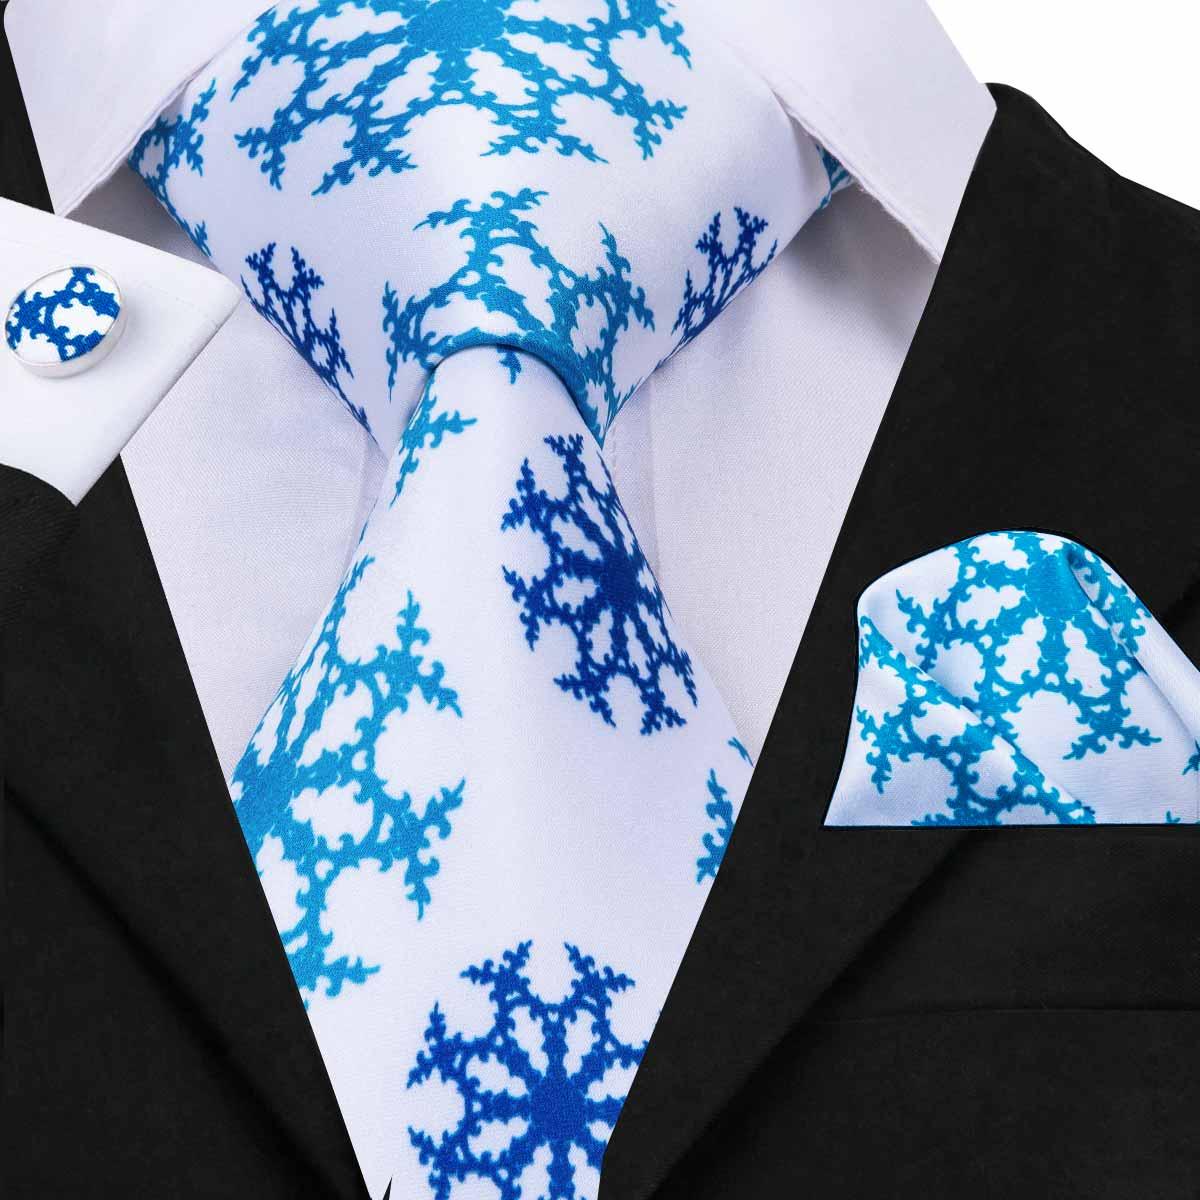 Hi-Tie Silk  Men's Blue White Tie Snow Floral 2019 Fashion Ties For Men Necktie Pocket Square Set Beauty Wedding Ties C-3094